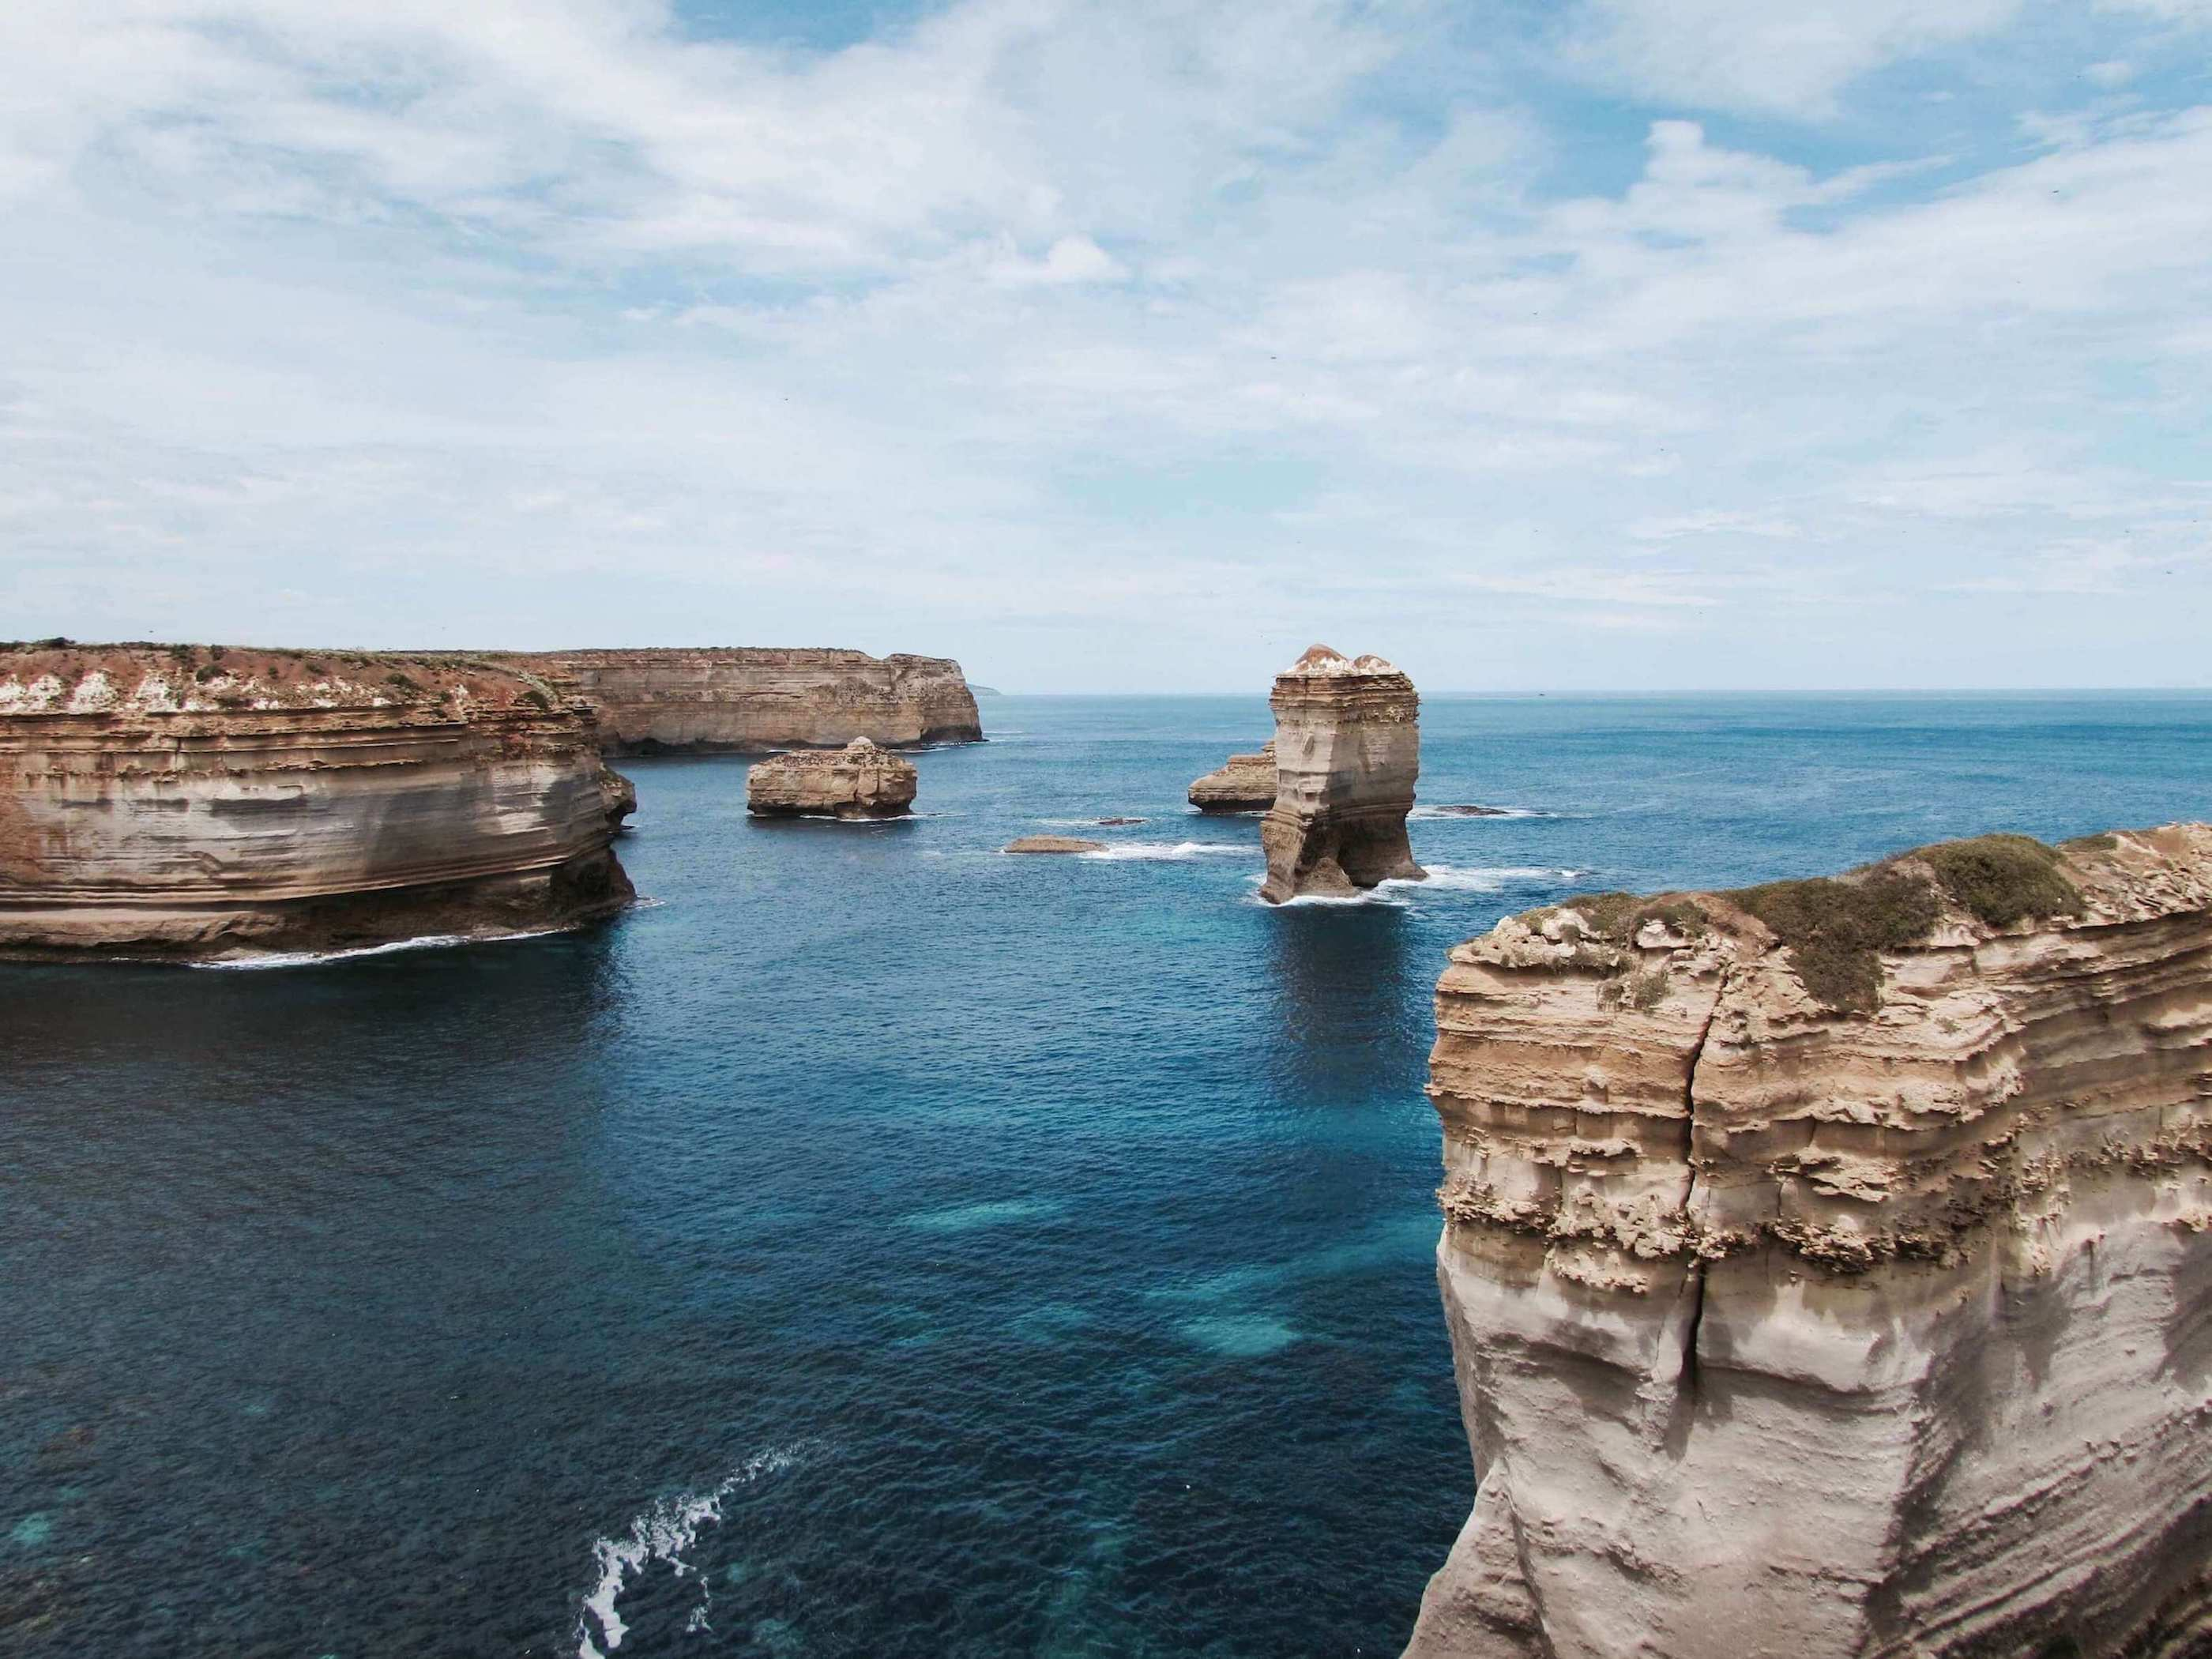 Bay of Islands Australia